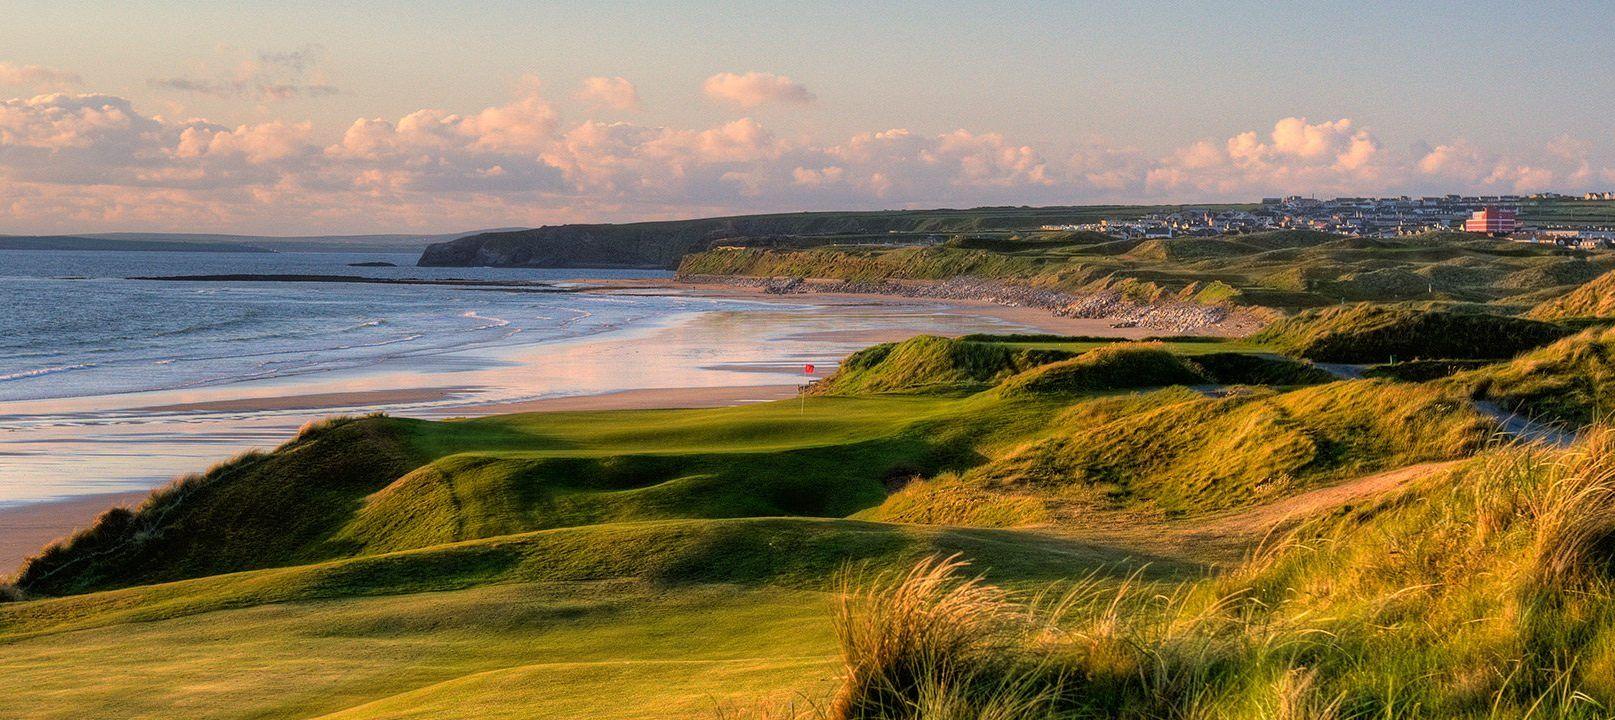 golf-expedition-leukste-golfbanen-mooiste-landen-beste-hotels-voor-golfen